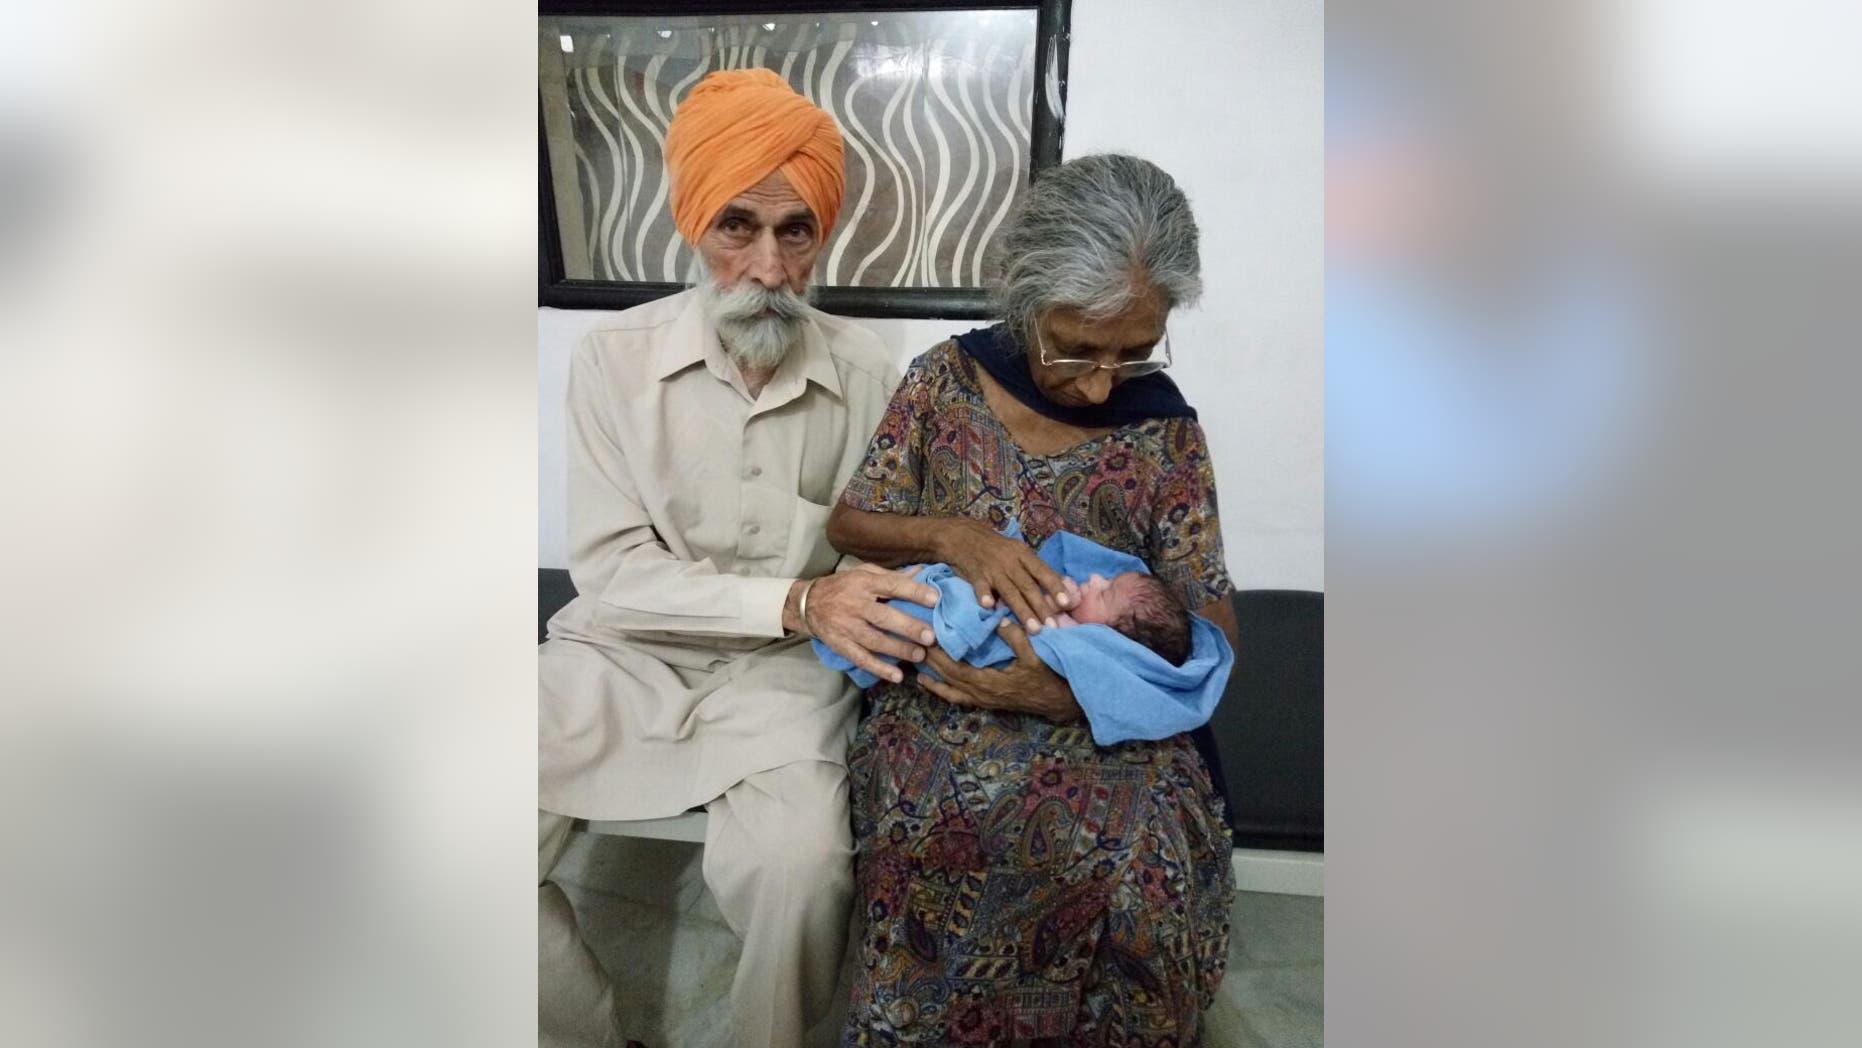 Mohinder Singh Gill and Daljinder Kaur with their newborn son.